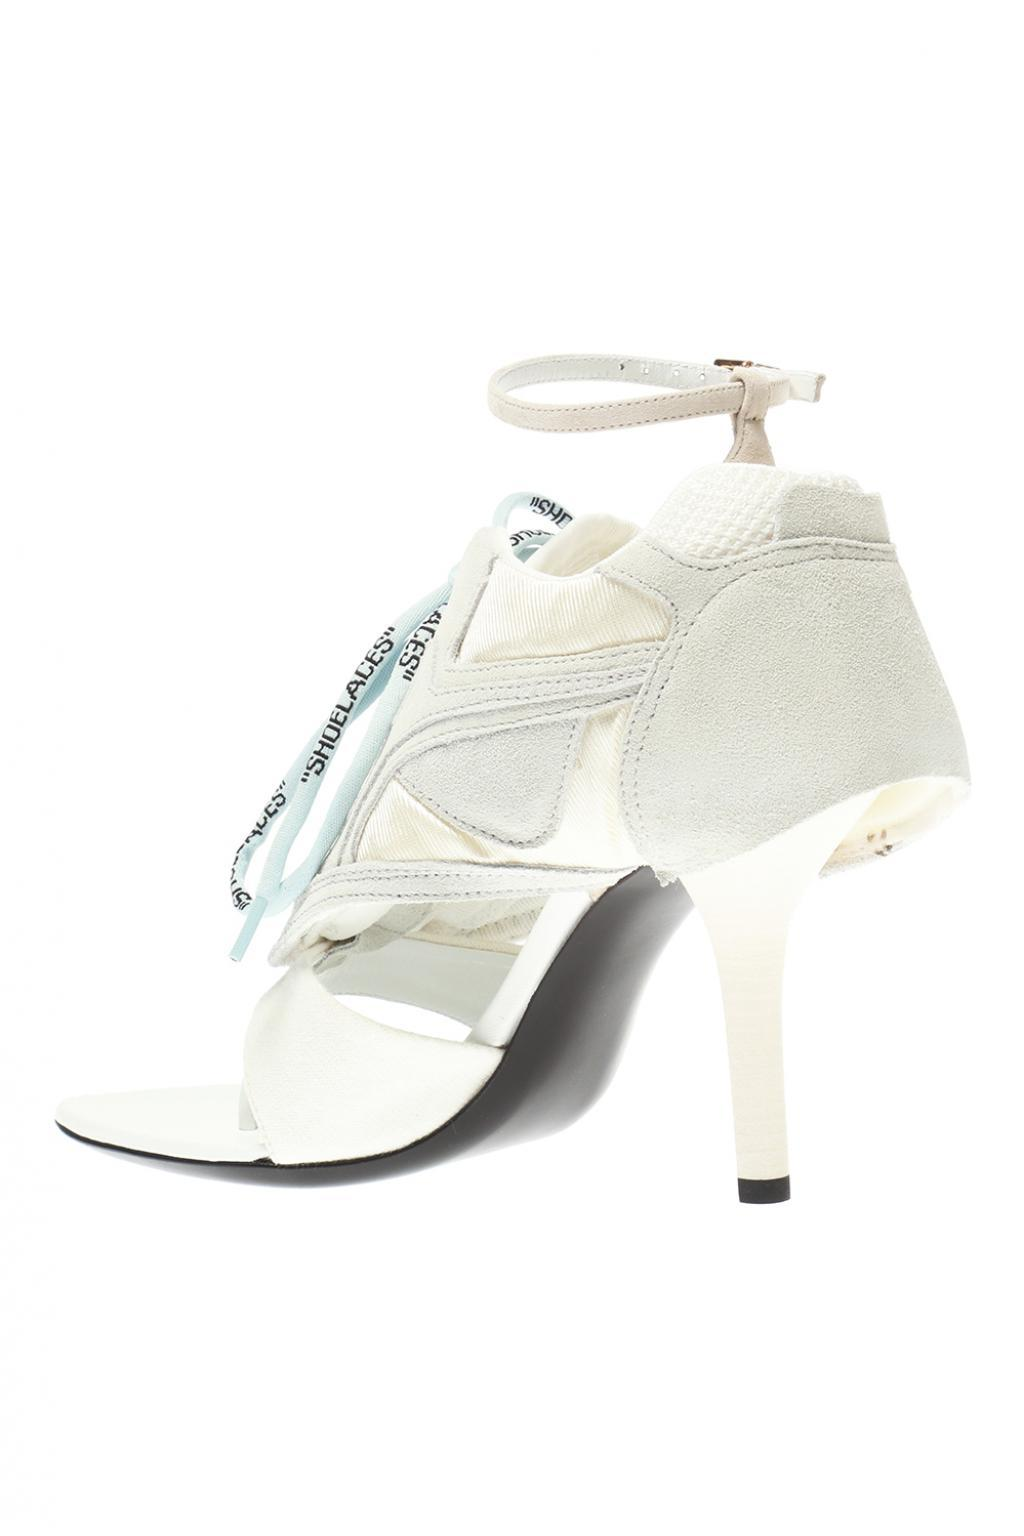 5228ea6c01d ... Virgil Abloh - White Heeled Sandals With Logo - Lyst. View fullscreen